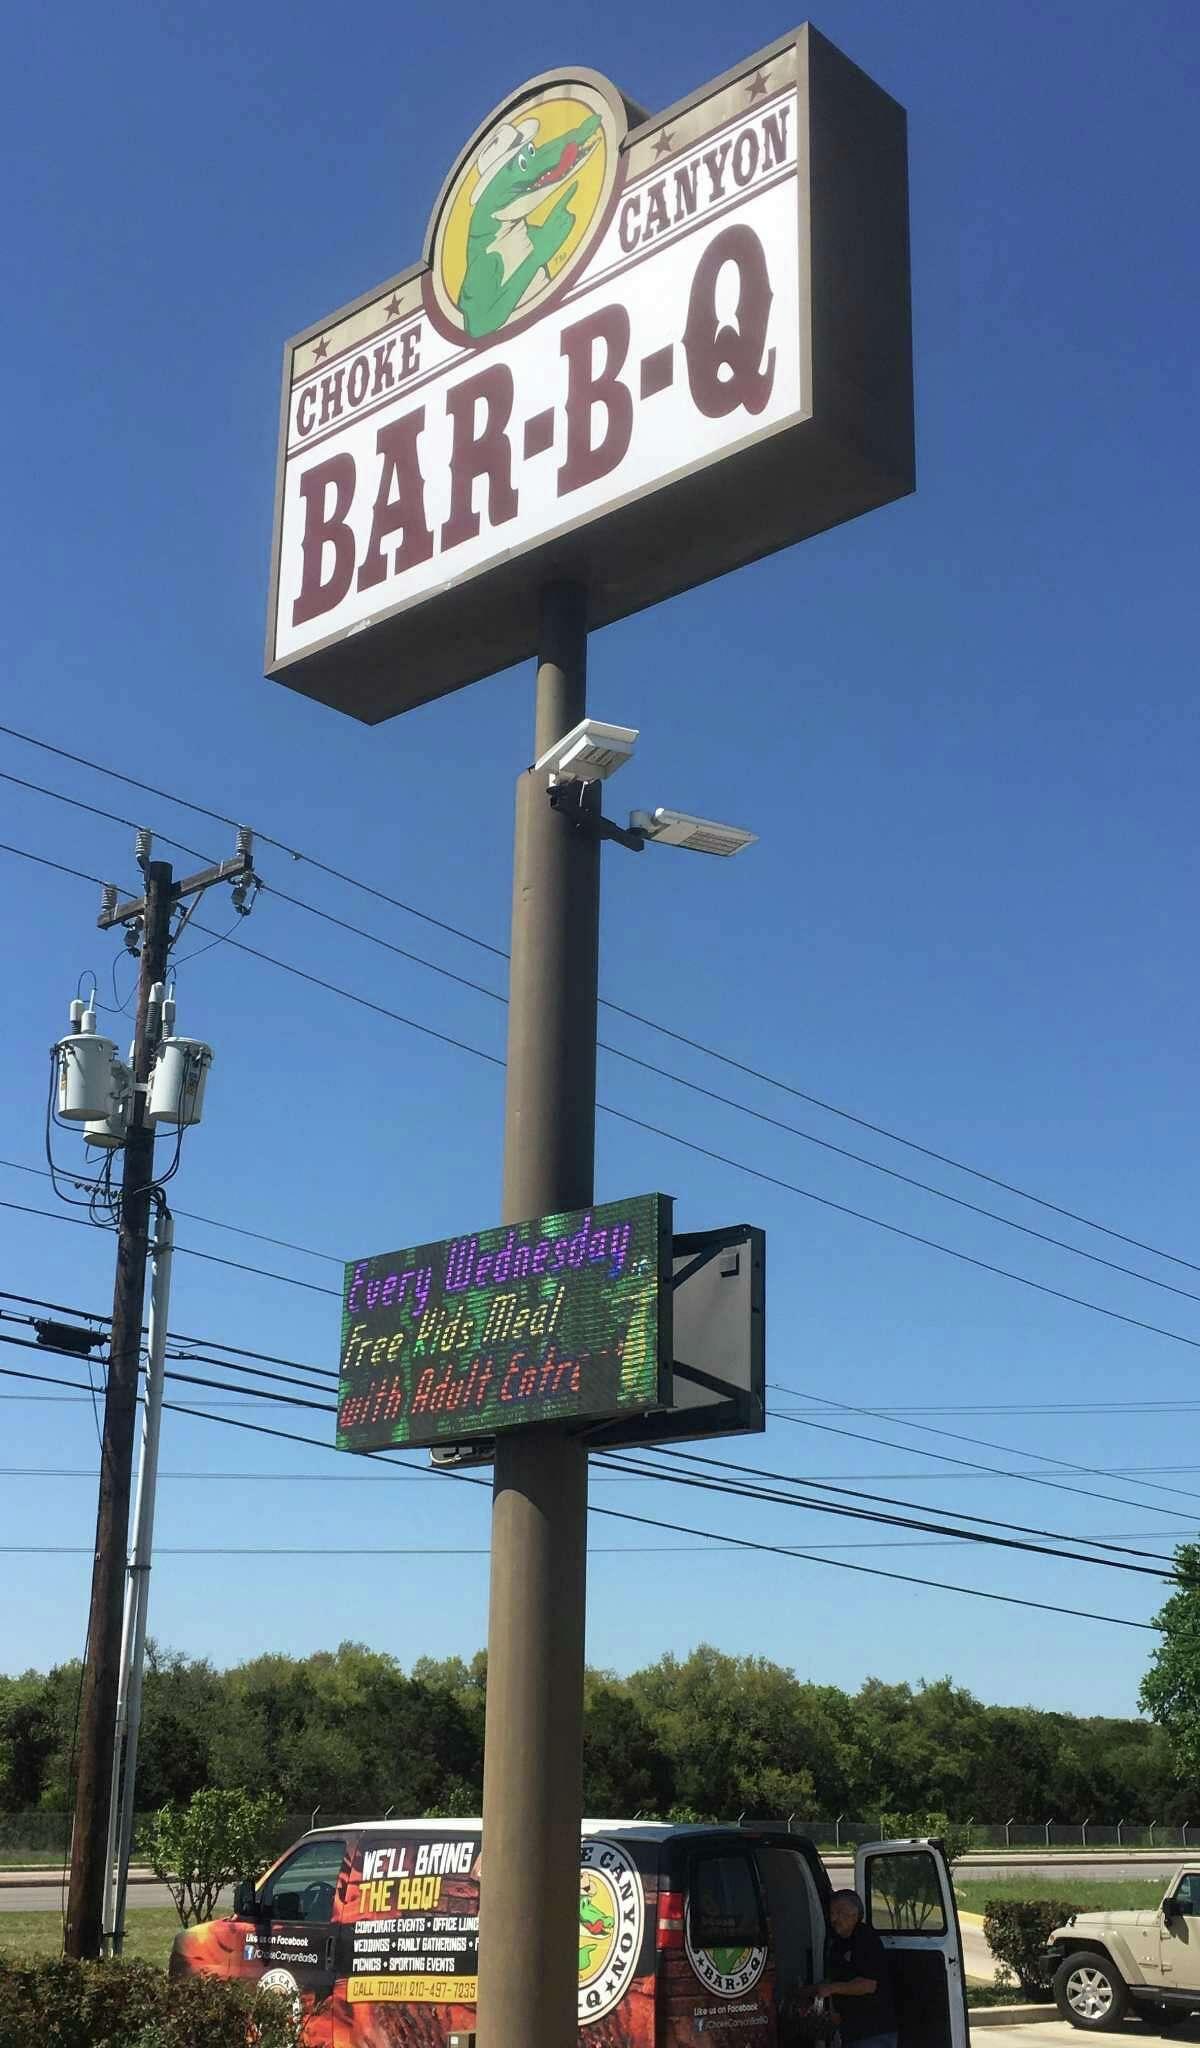 Choke Canyon Bar-B-Q, located at 21510 Blanco Road, serves a large area outside Loop 1604.